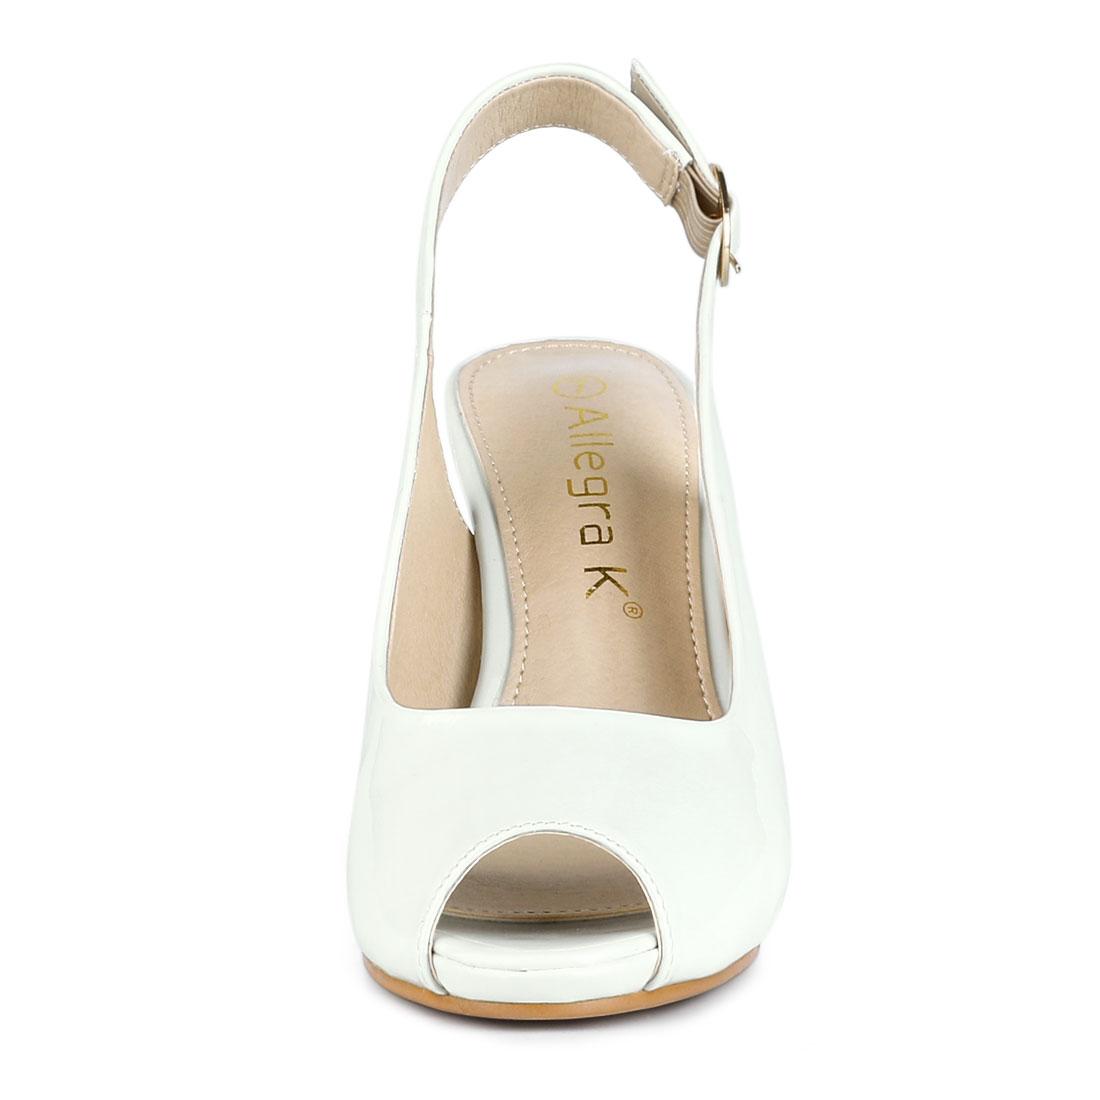 Women's Peep Toe Chunky Heel Slingback Pumps White US 8.5/UK 6.5/EU 40 - image 3 de 7